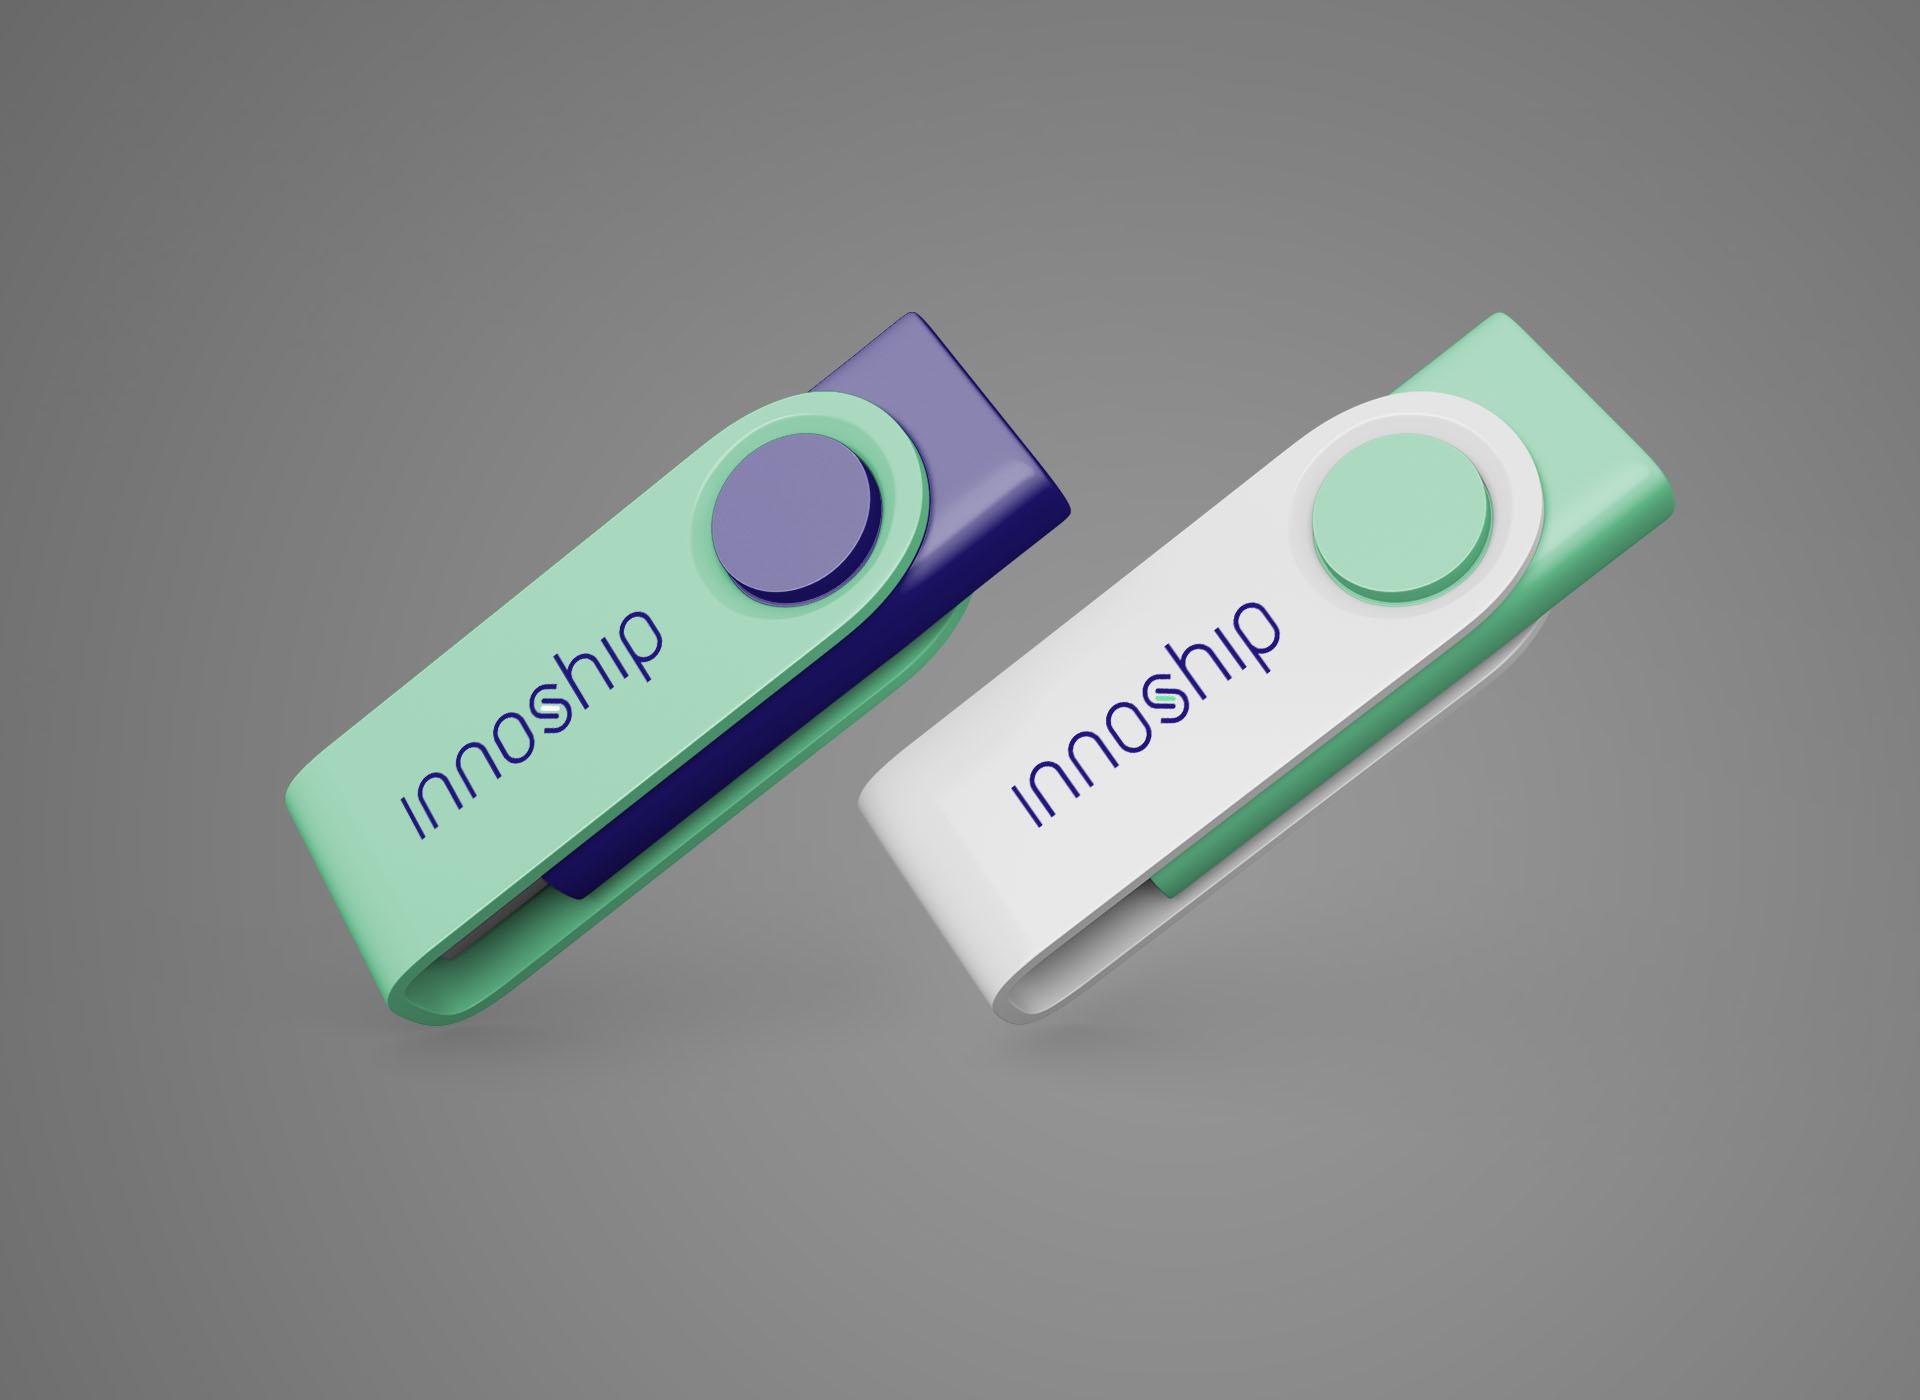 Innoship portofoliu inoveo USB